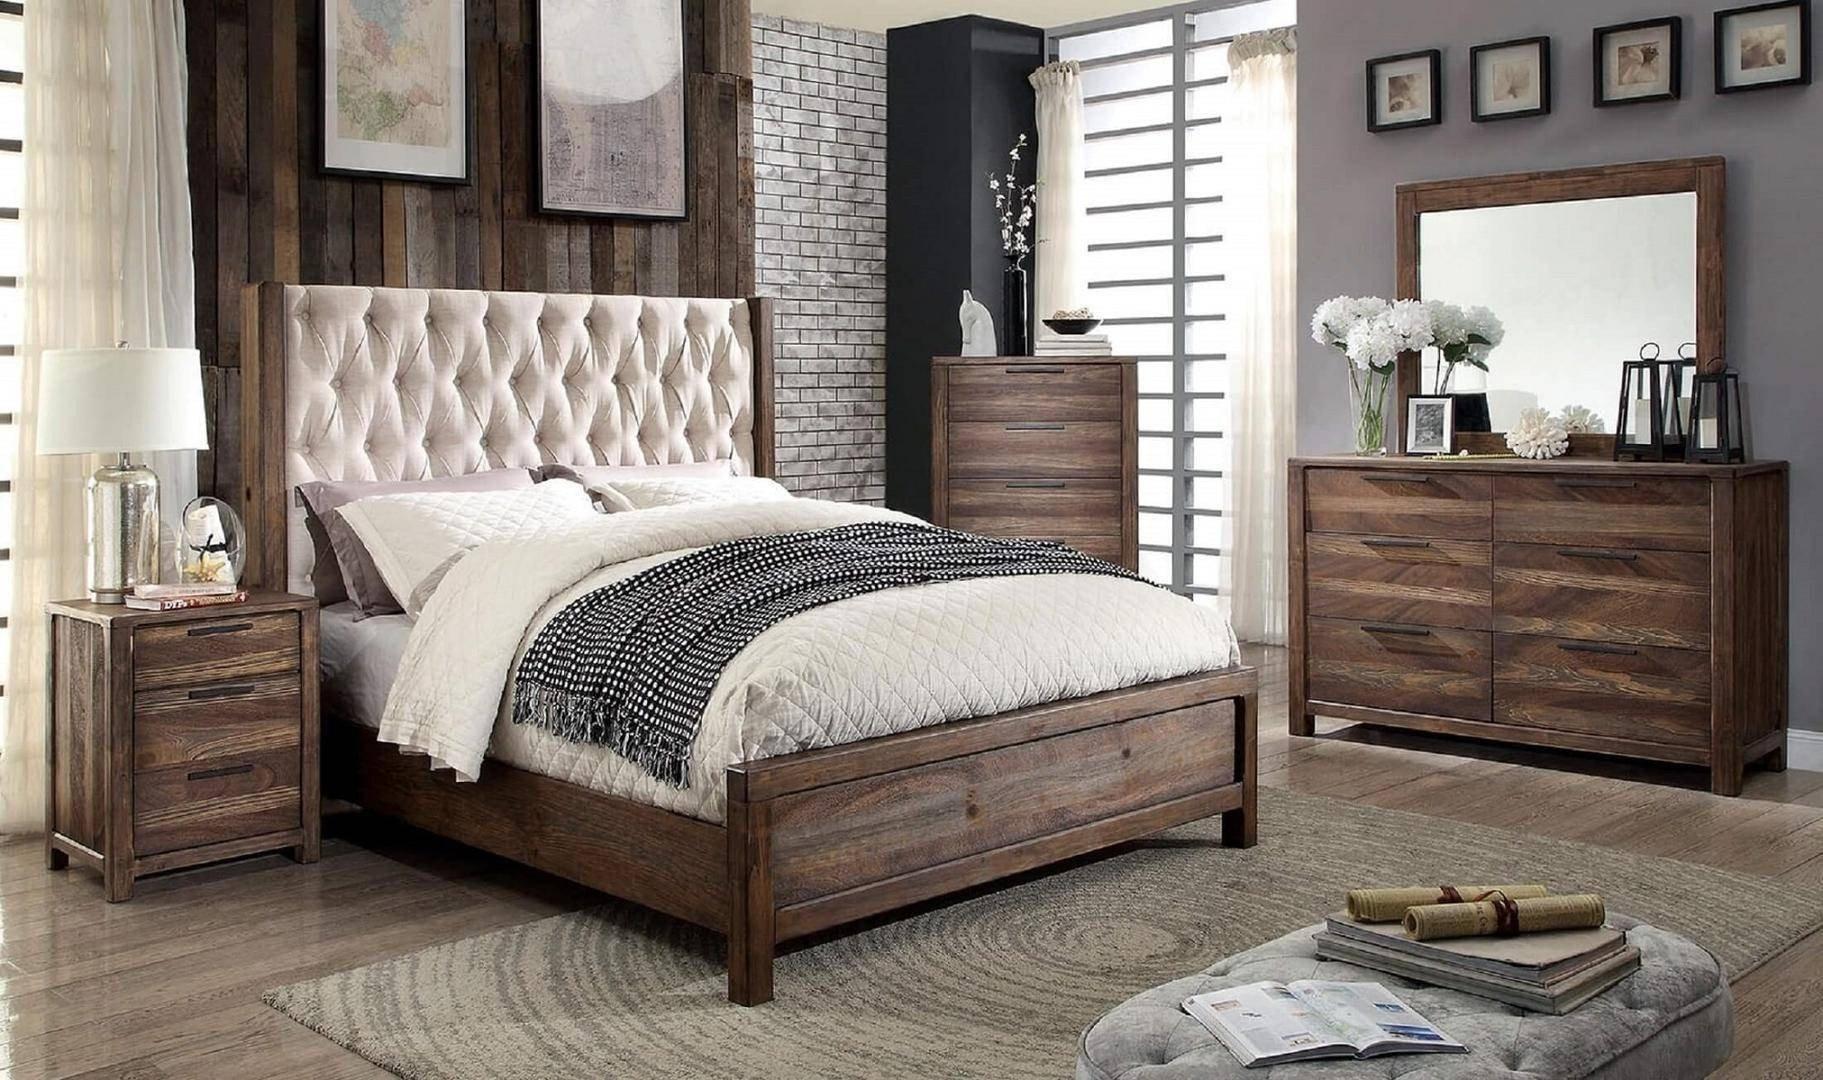 Rustic King Bedroom Set Best Of Rustic King Bedroom Set 4 Pcs Brown Hutchinson Furniture Of